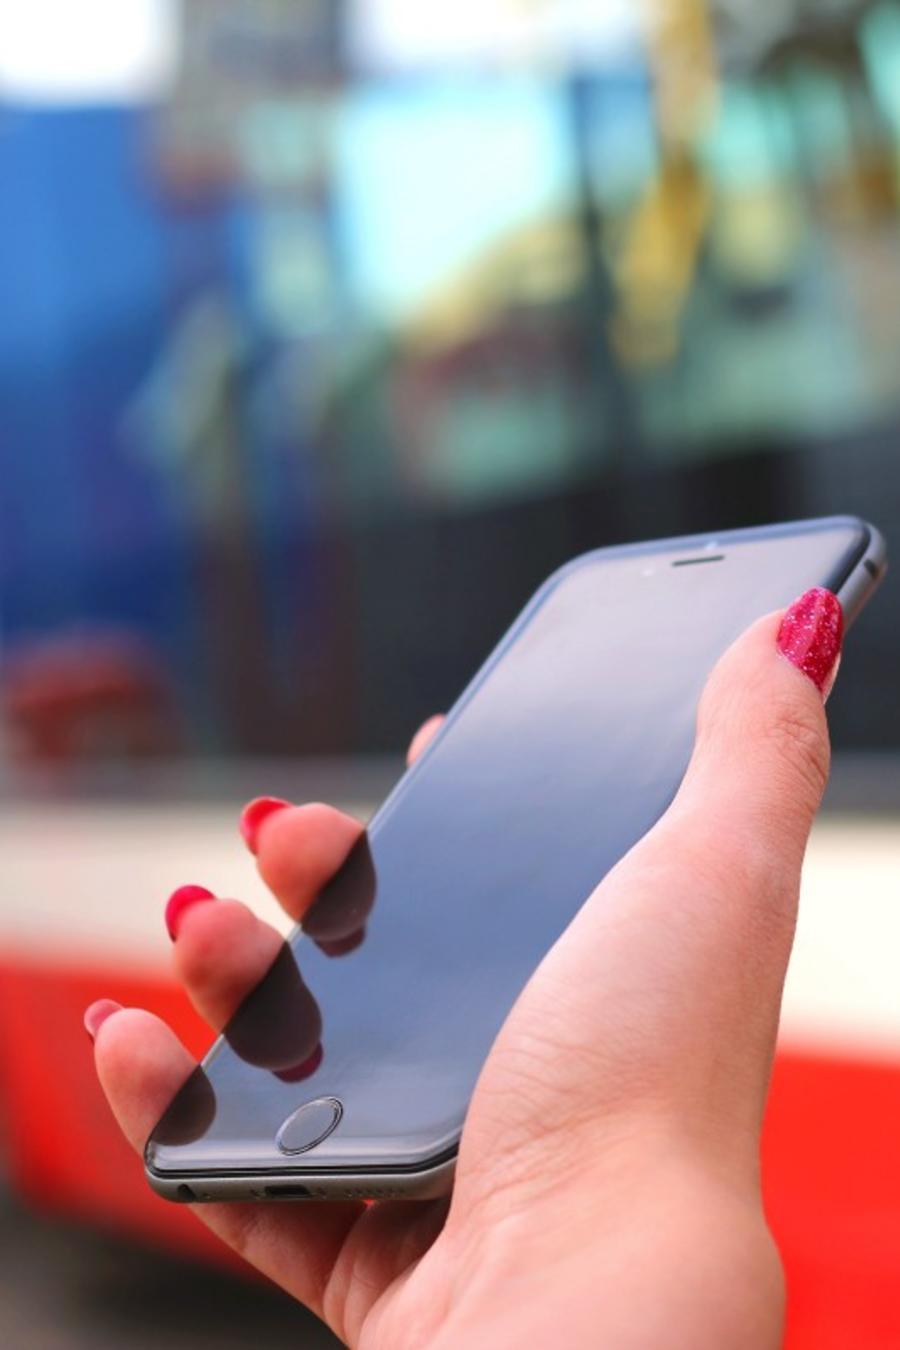 cellphone on hand